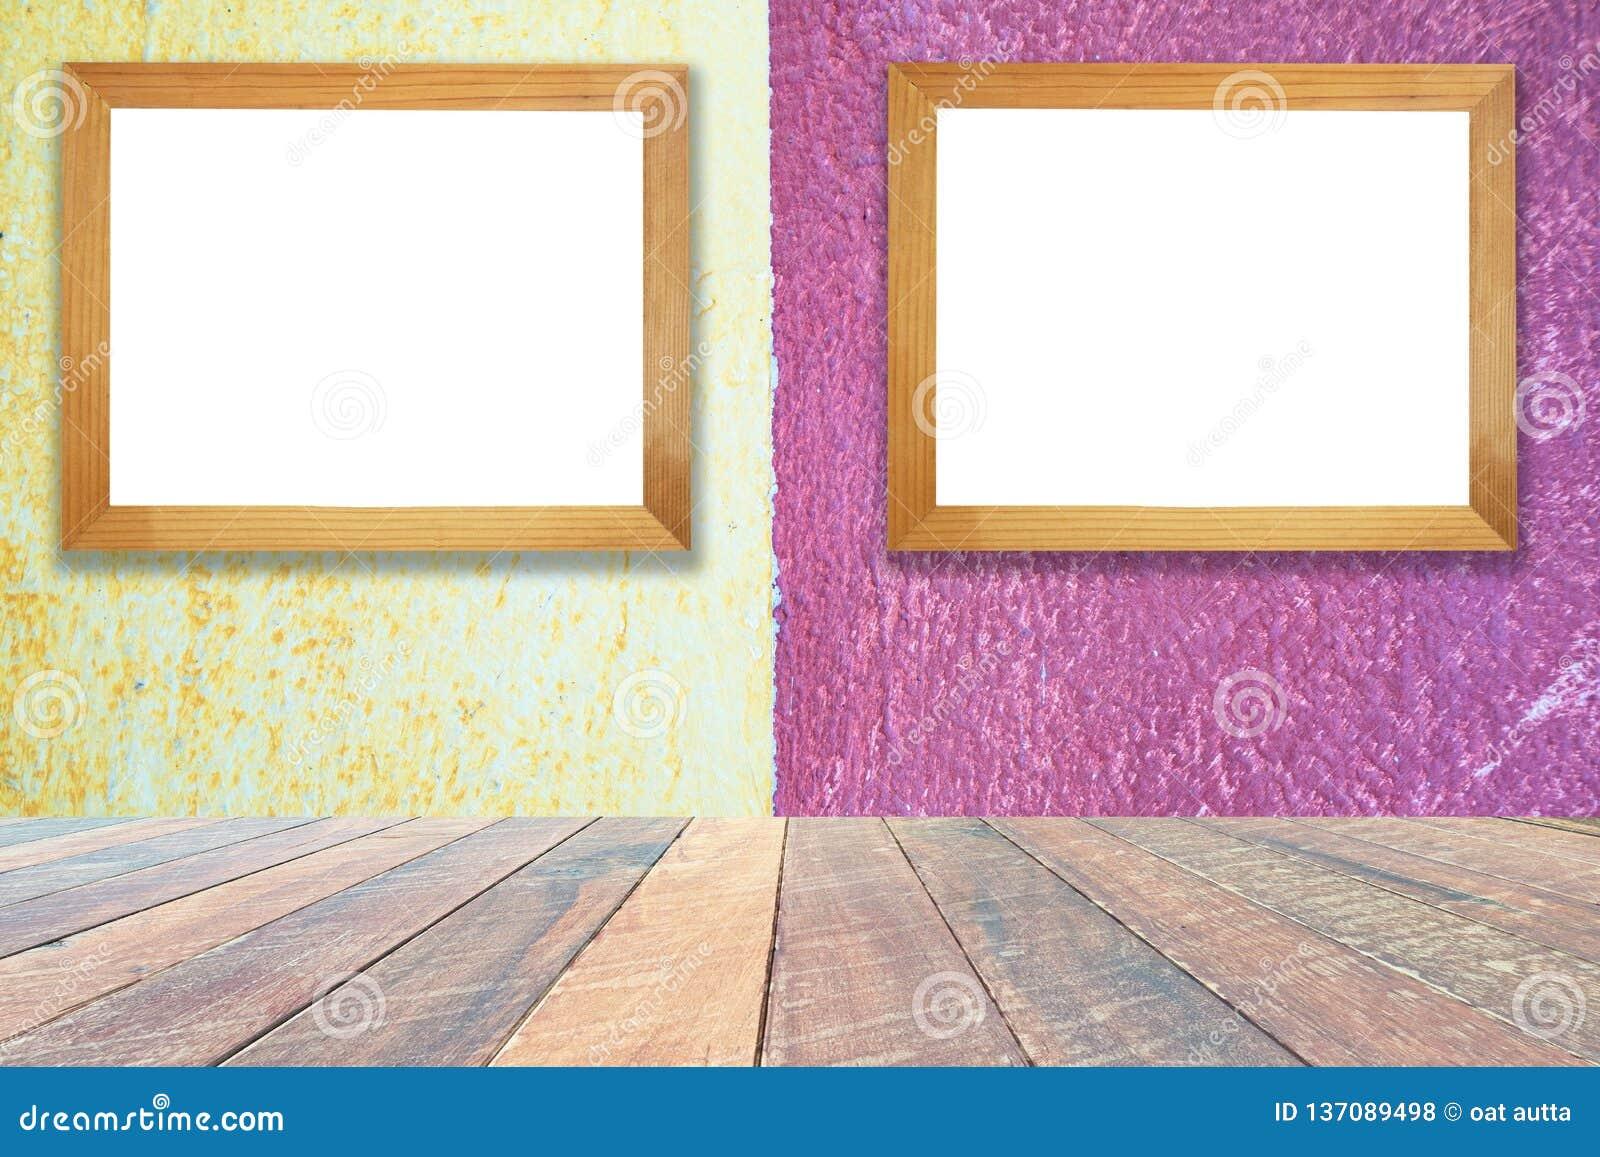 Mur Jaune Et Rose De Ciment De Peinture Fond De Texturedâ